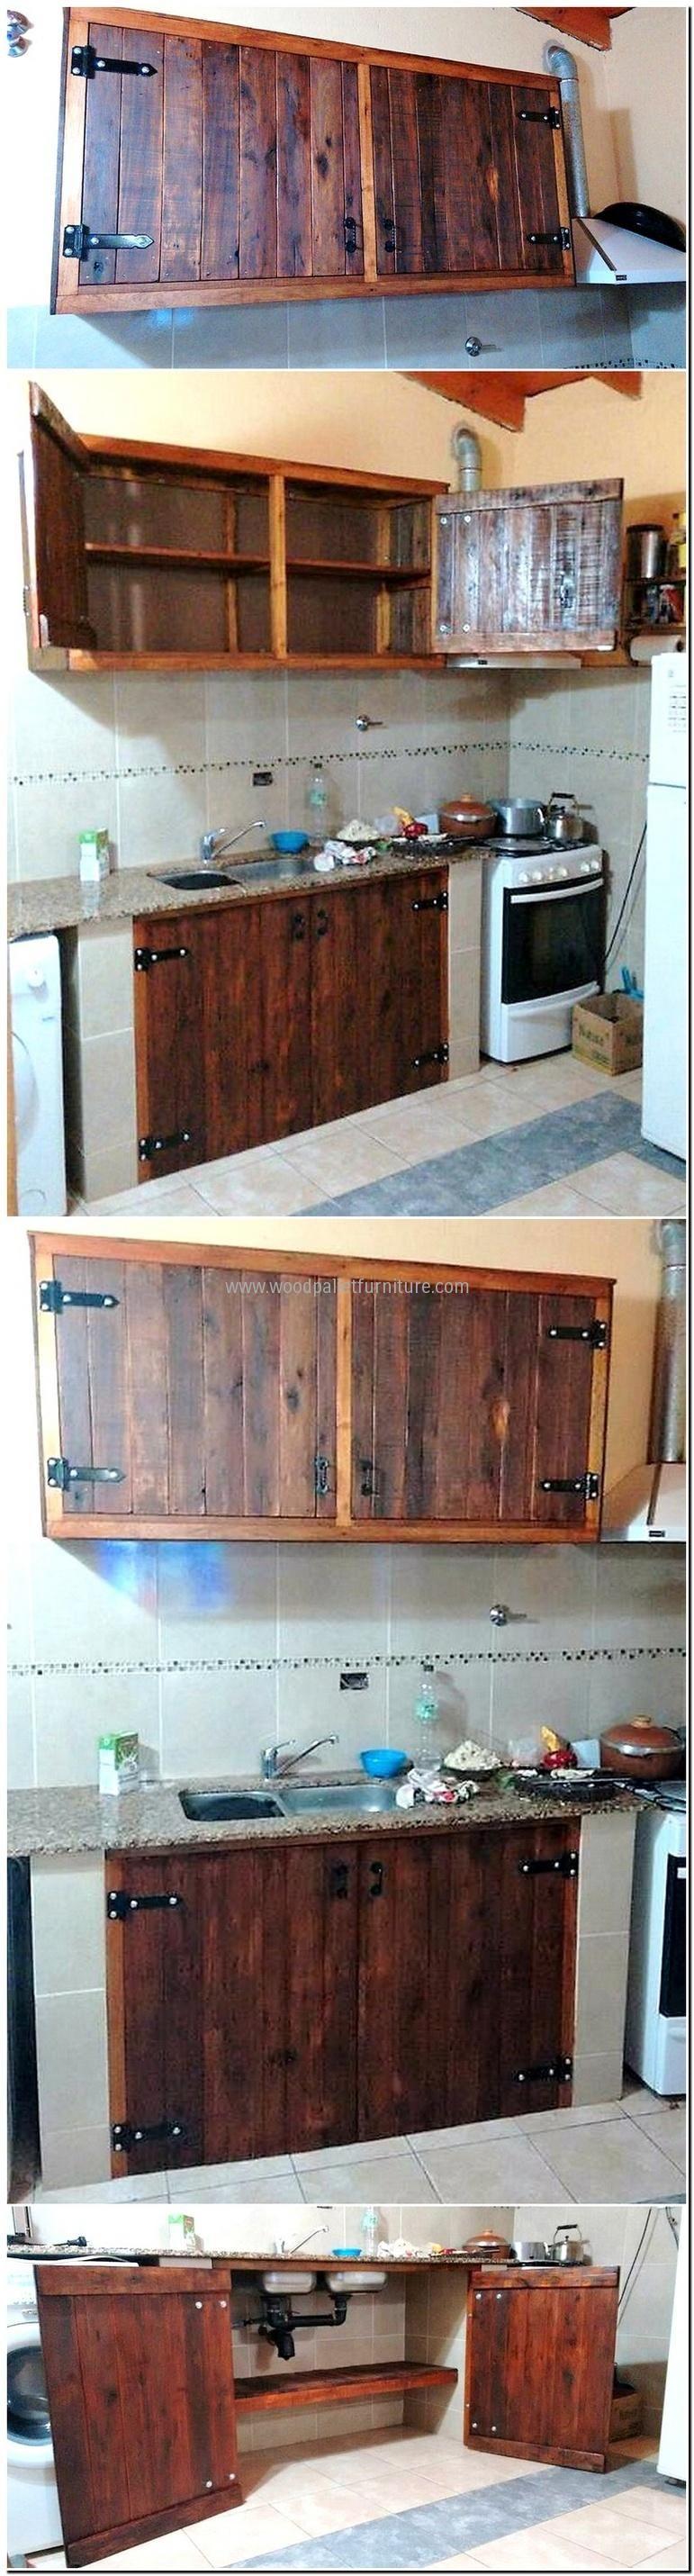 rustic pallet cabinets | Wooden pallet crafts, Wood pallet ...